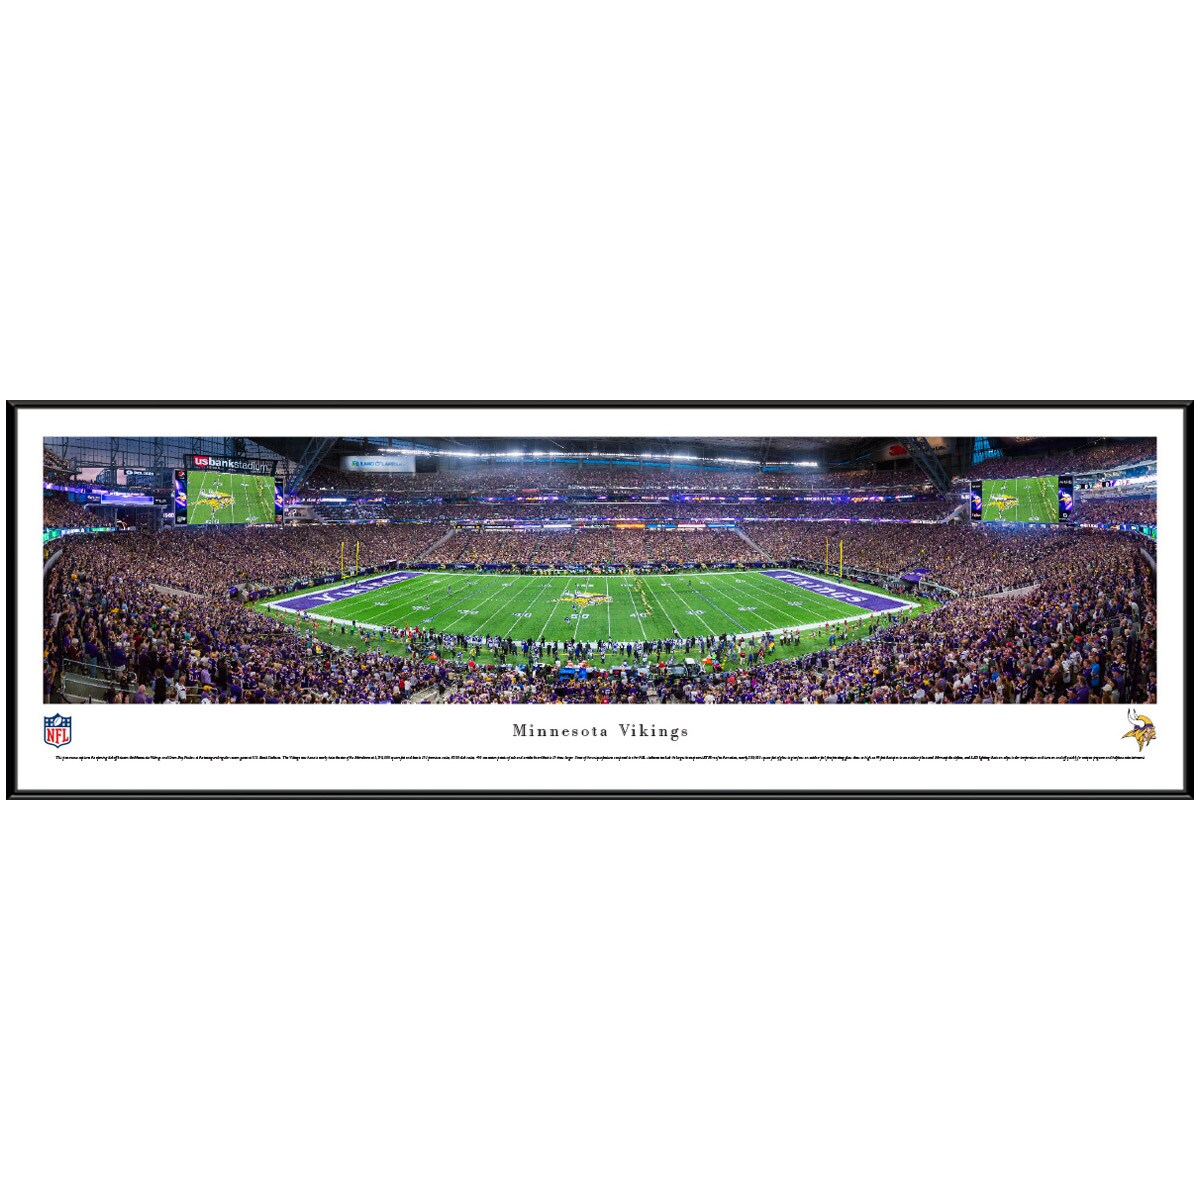 "Minnesota Vikings 40.25"" x 13.75"" Standard Frame Panoramic Photo"